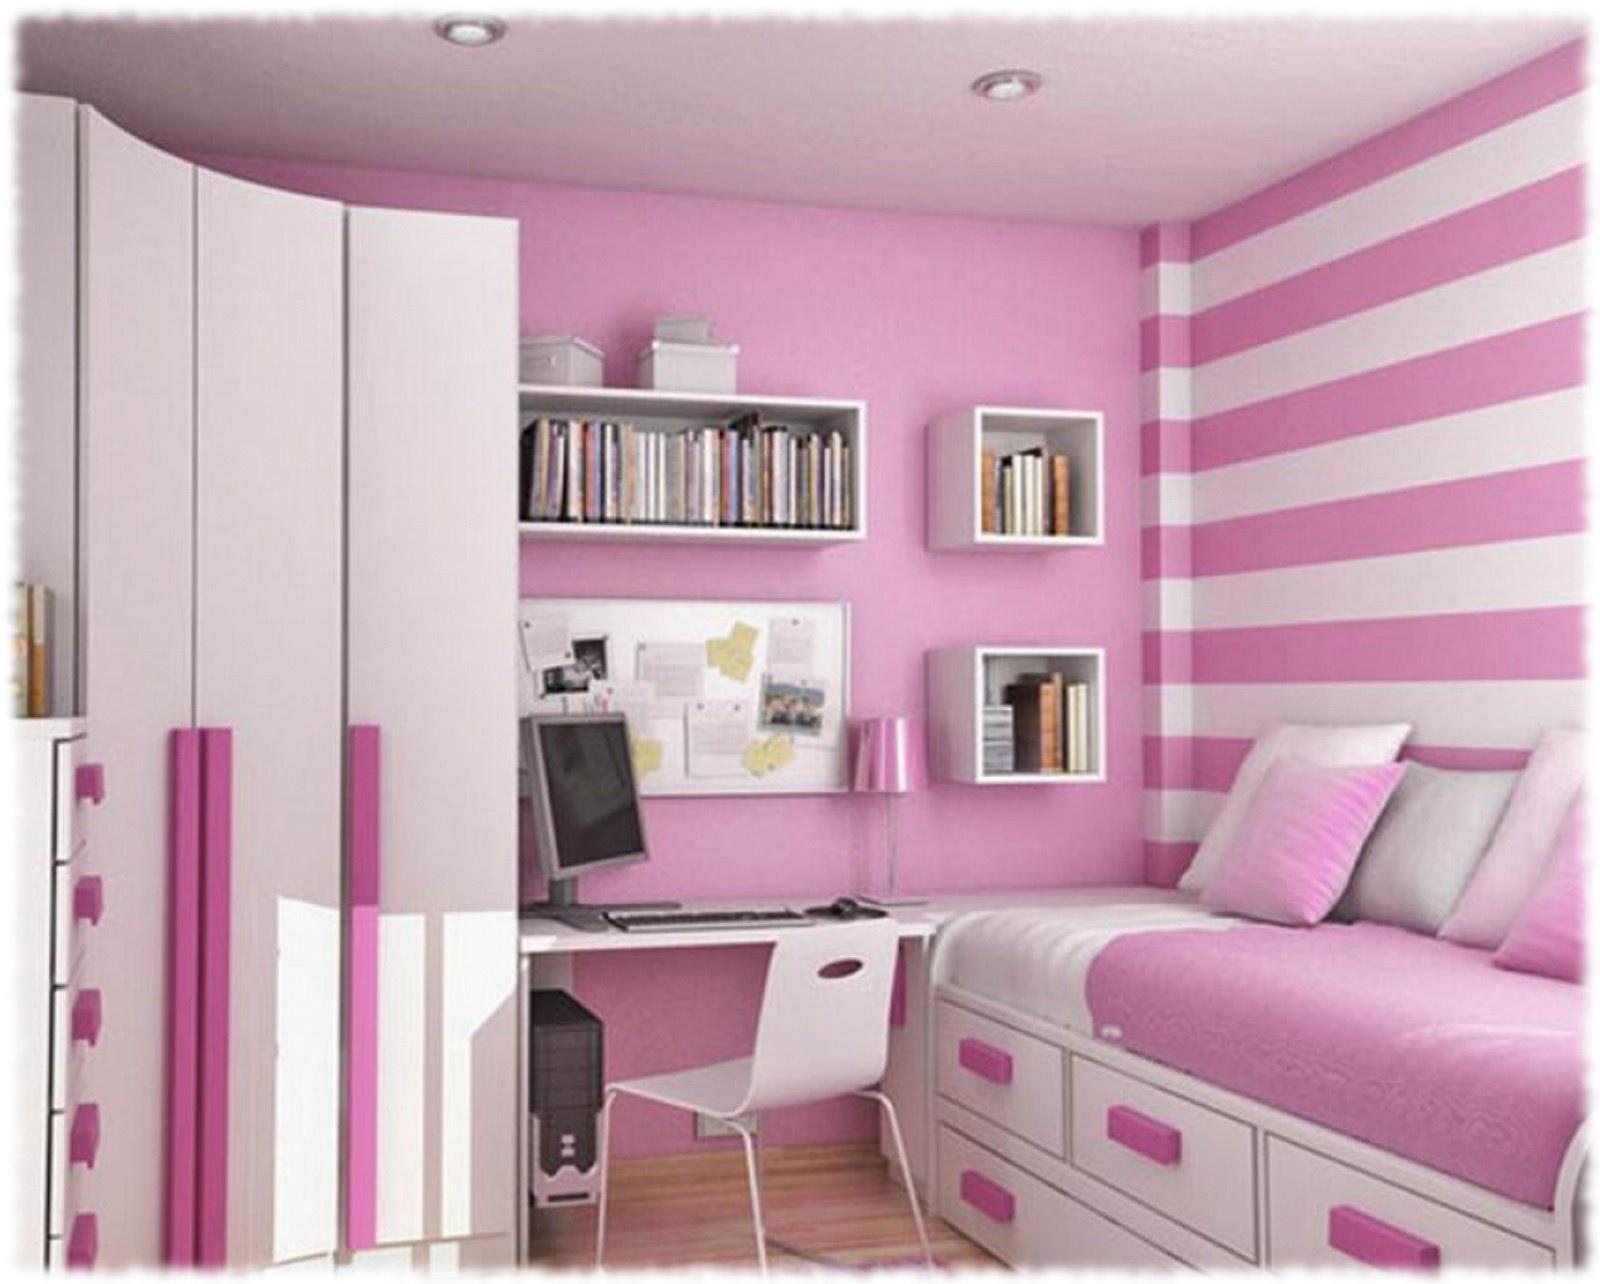 http://specialistadecoratore.it/wp-content/uploads/2015/04/Rosa.jpg